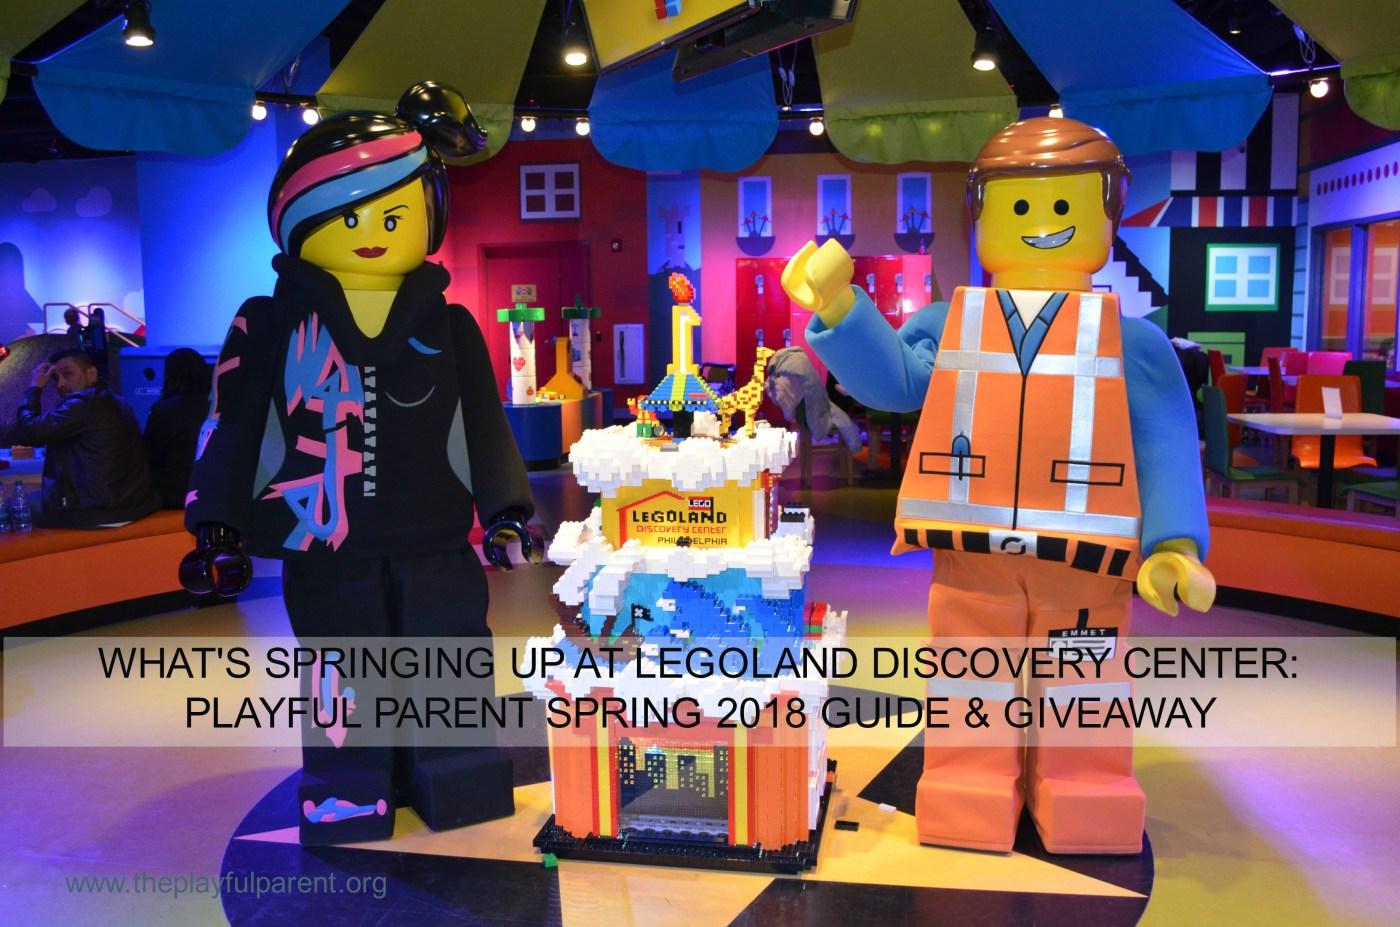 what 39 s springing up at legoland discovery center playful parent spring 2018 guide giveaway. Black Bedroom Furniture Sets. Home Design Ideas